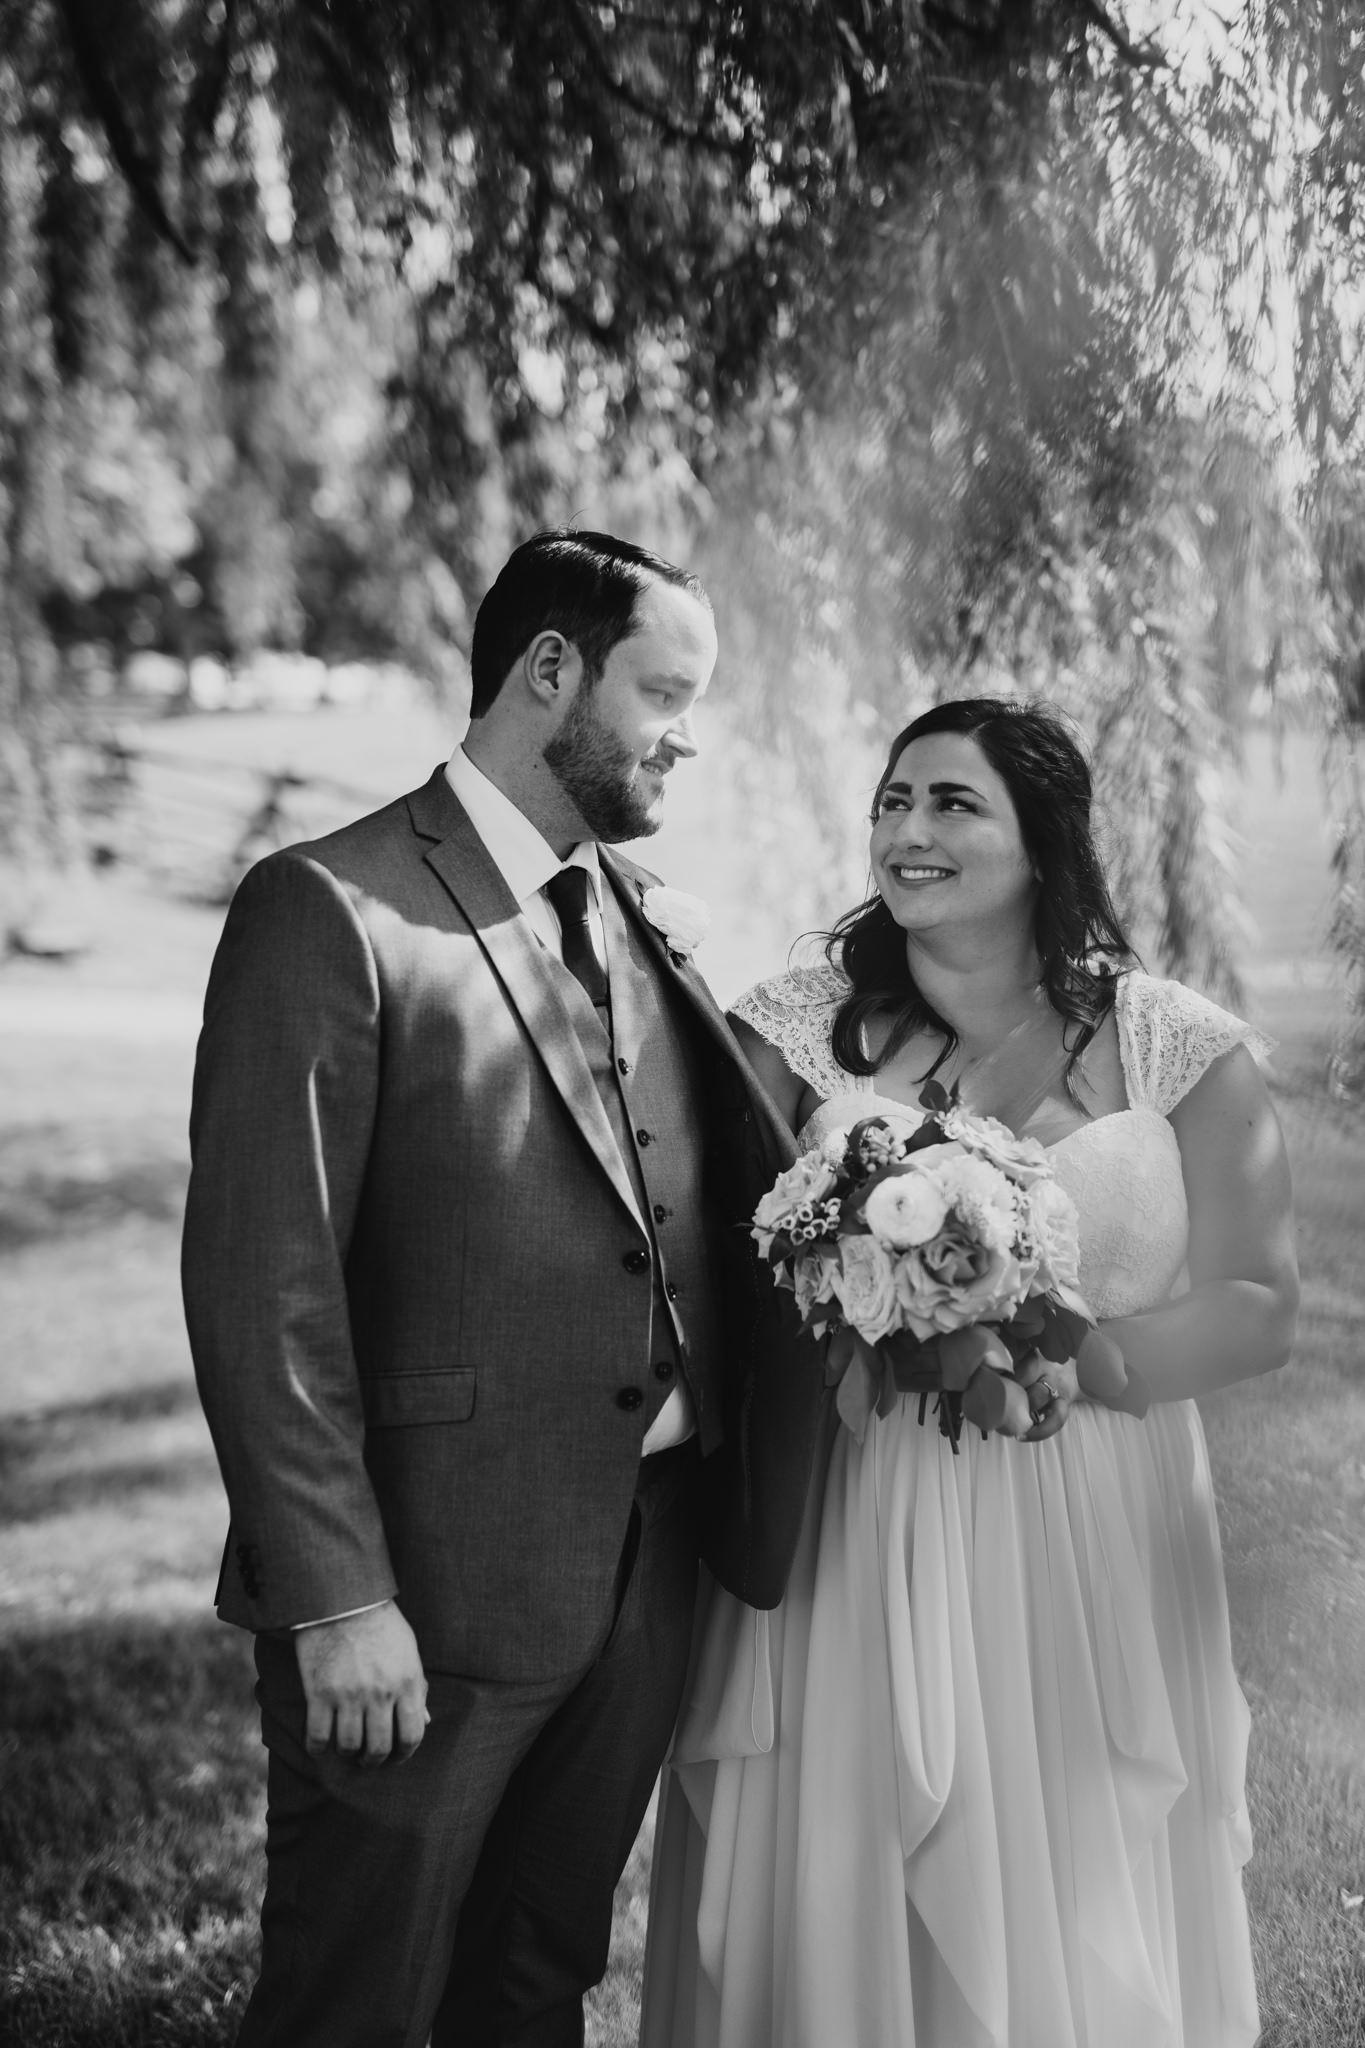 Vintage styled, wedding photography